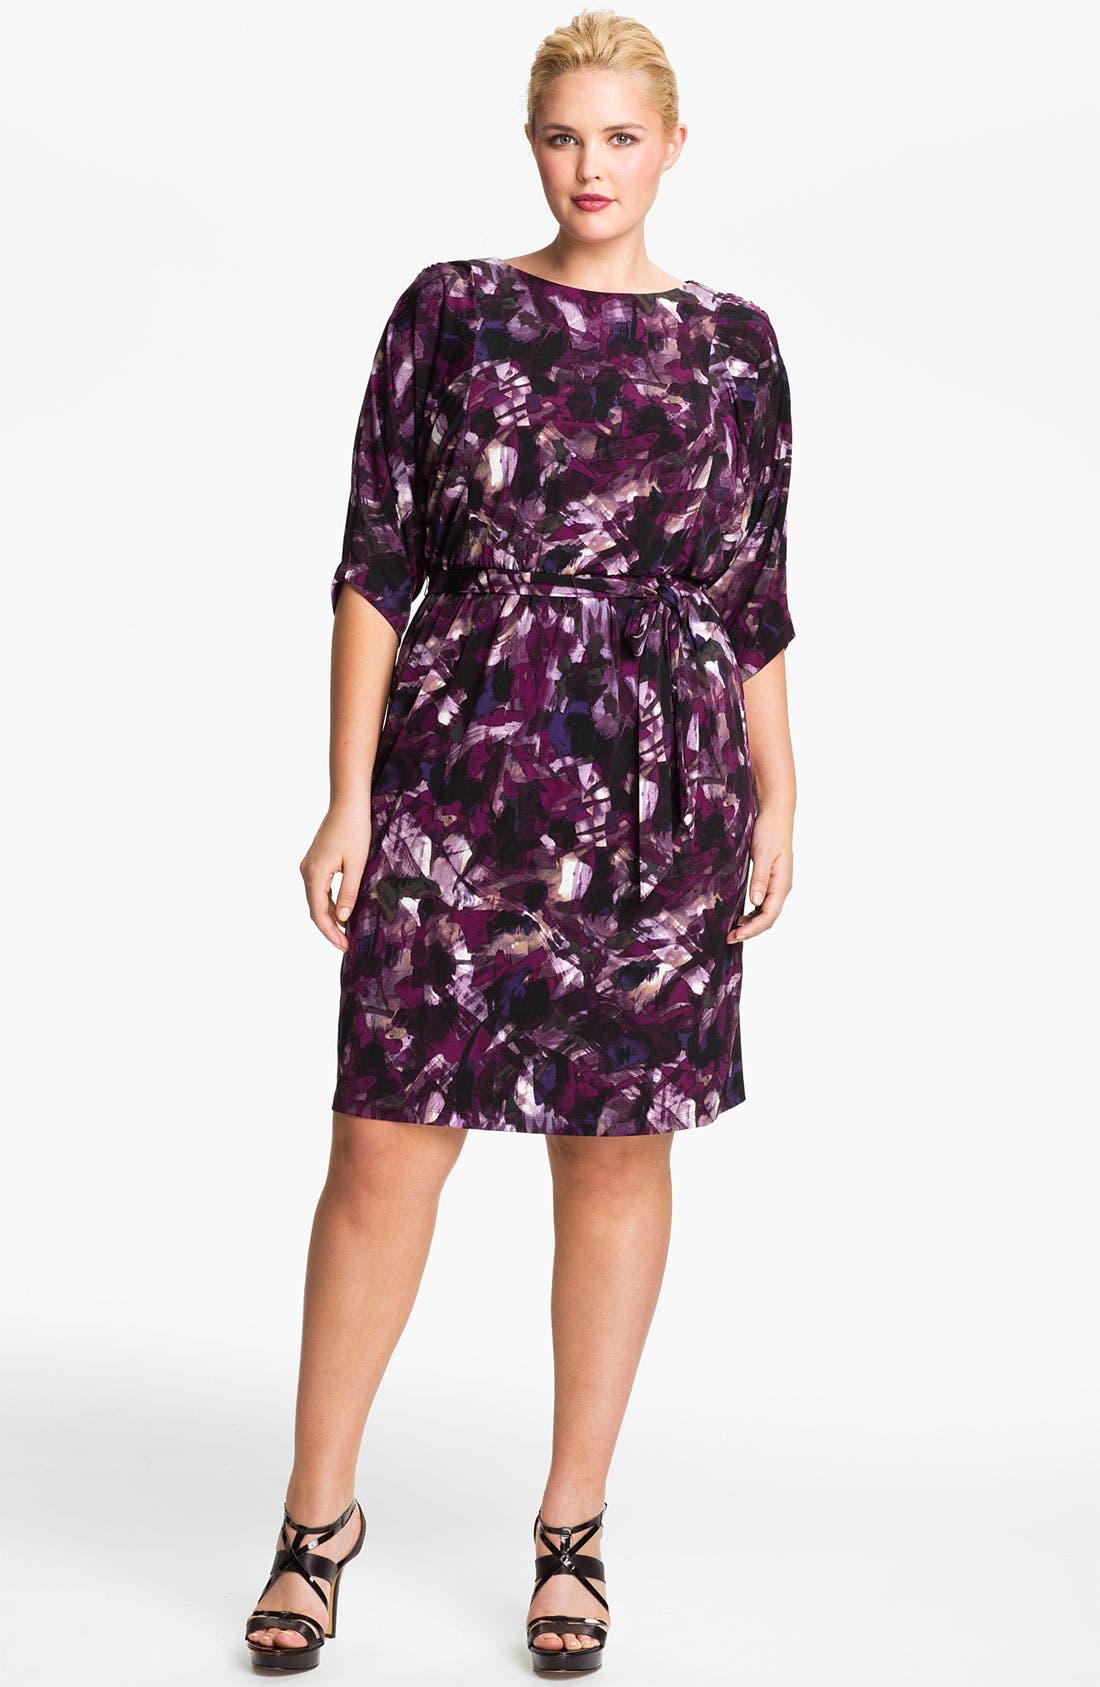 Alternate Image 1 Selected - Eliza J Tie Waist Blouson Dress (Plus)